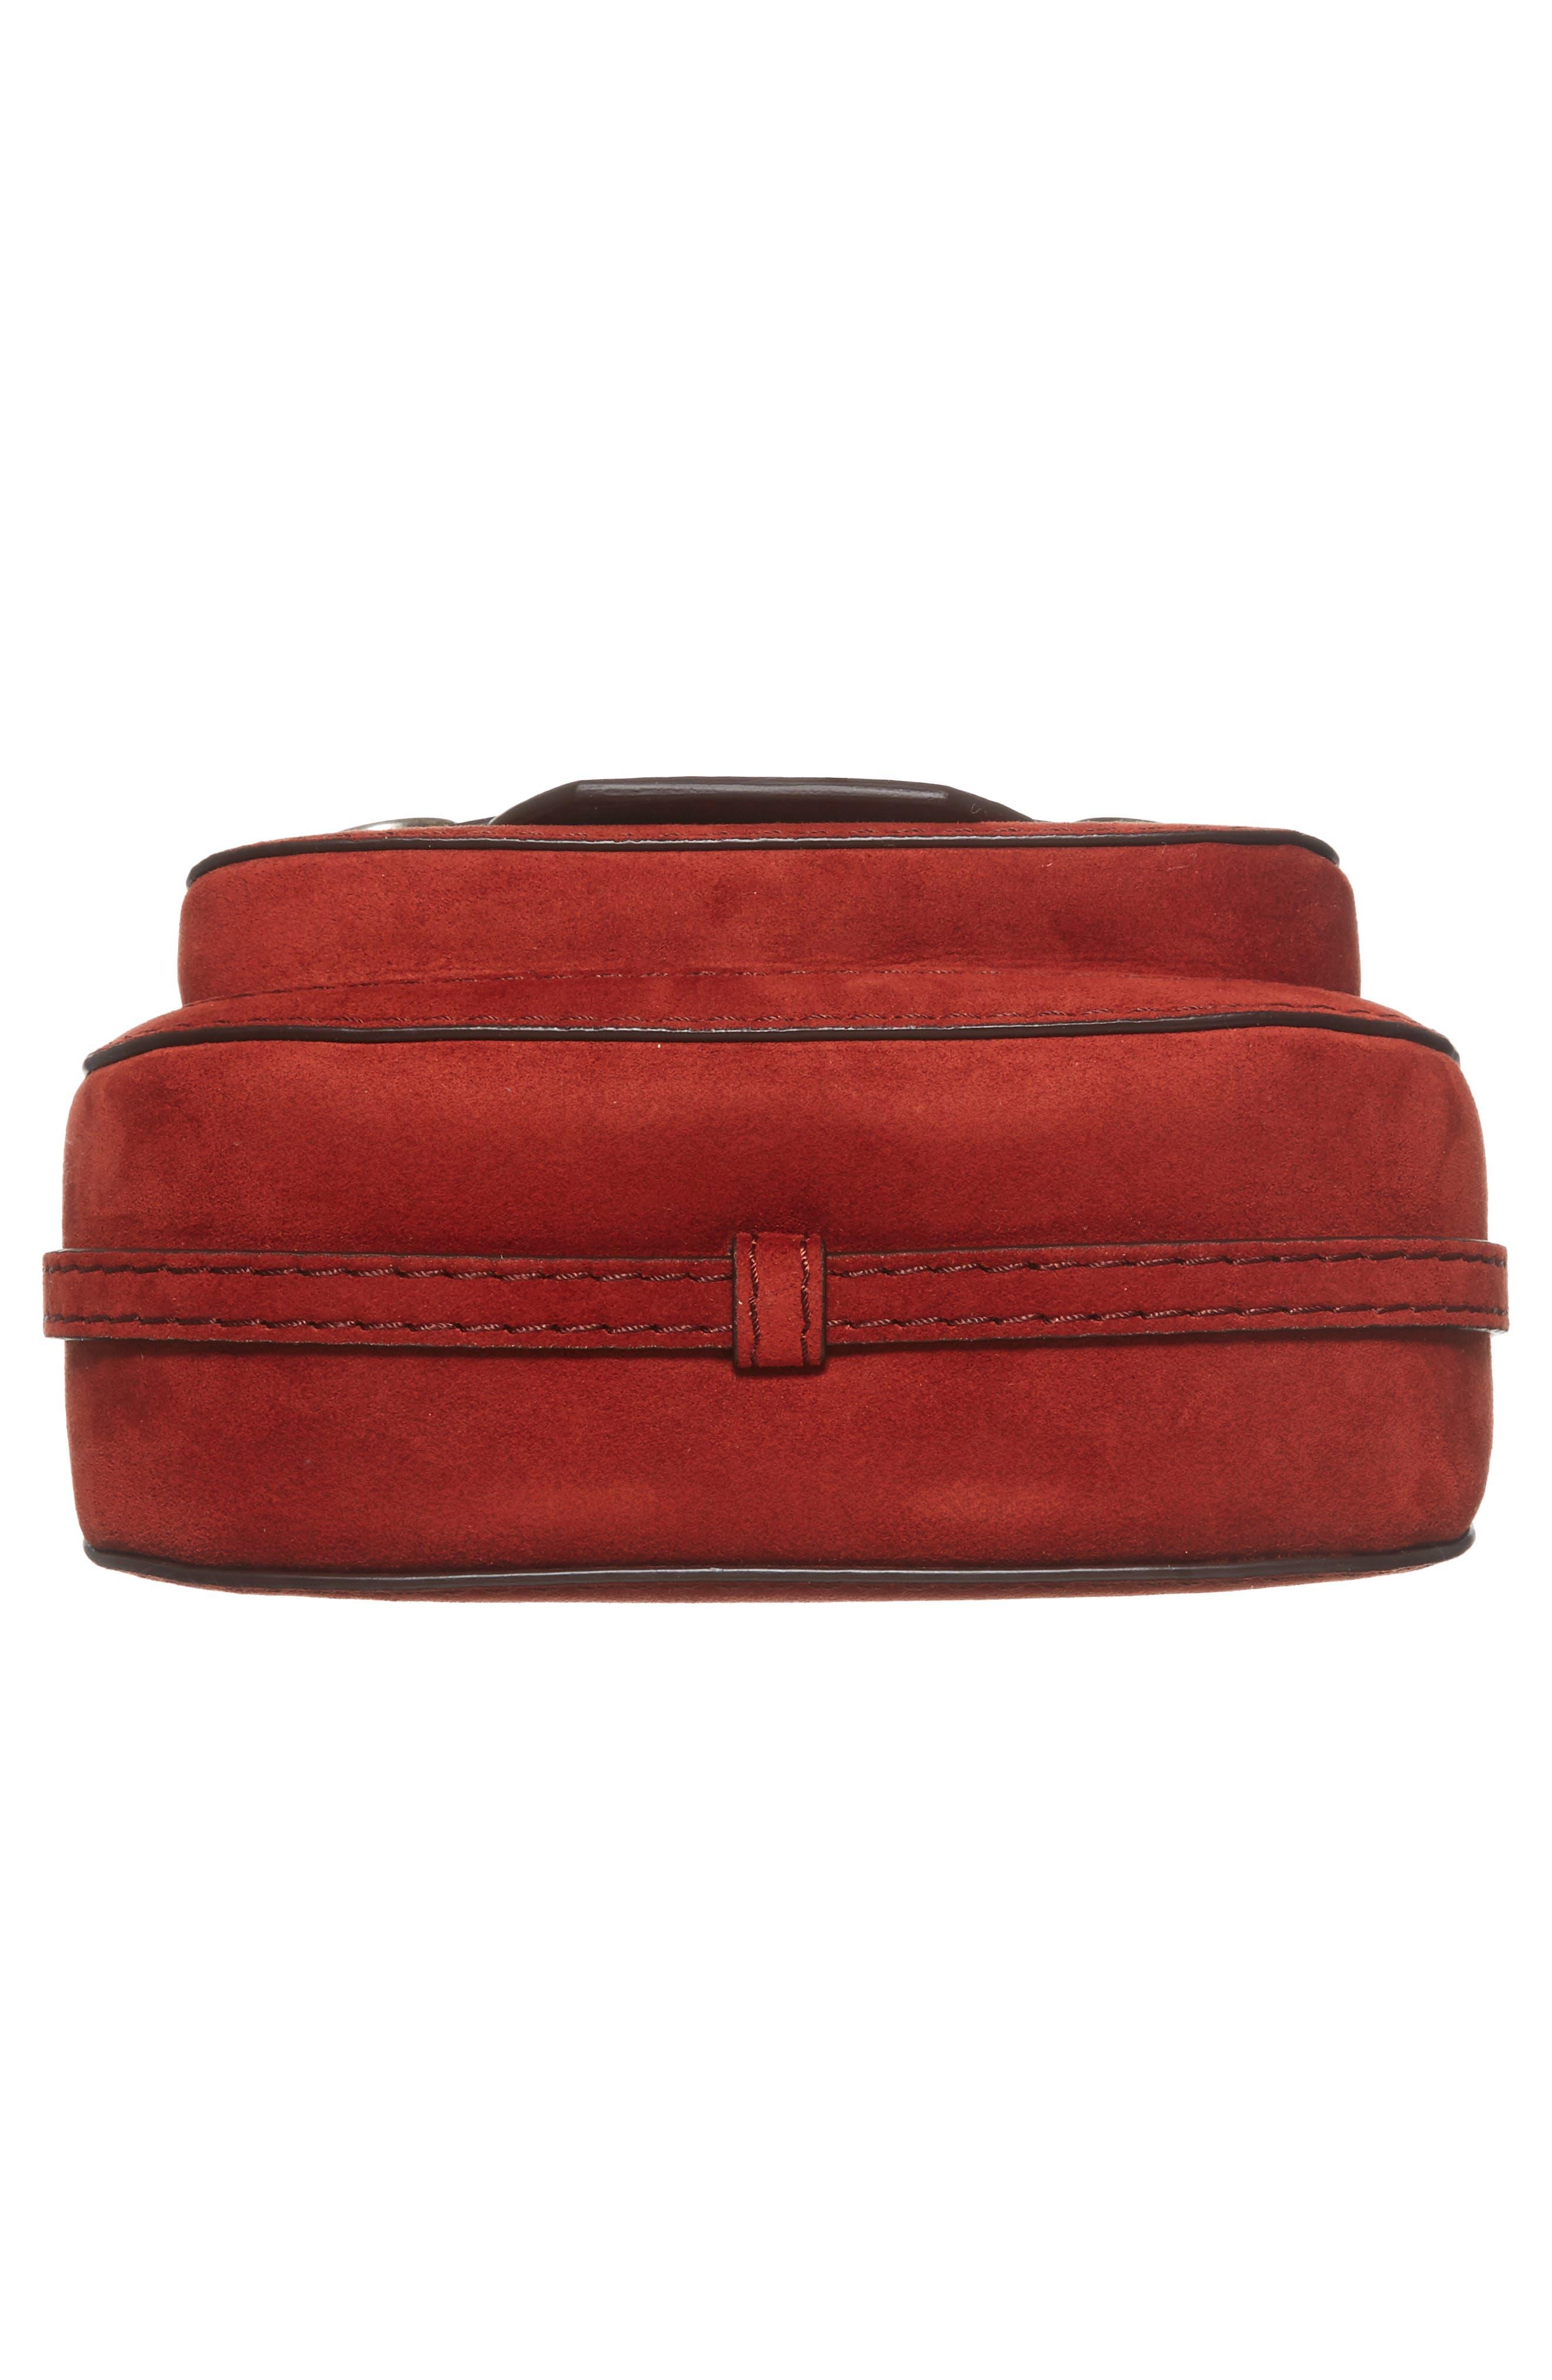 Faux Leather Shoulder Bag,                             Alternate thumbnail 5, color,                             Henna